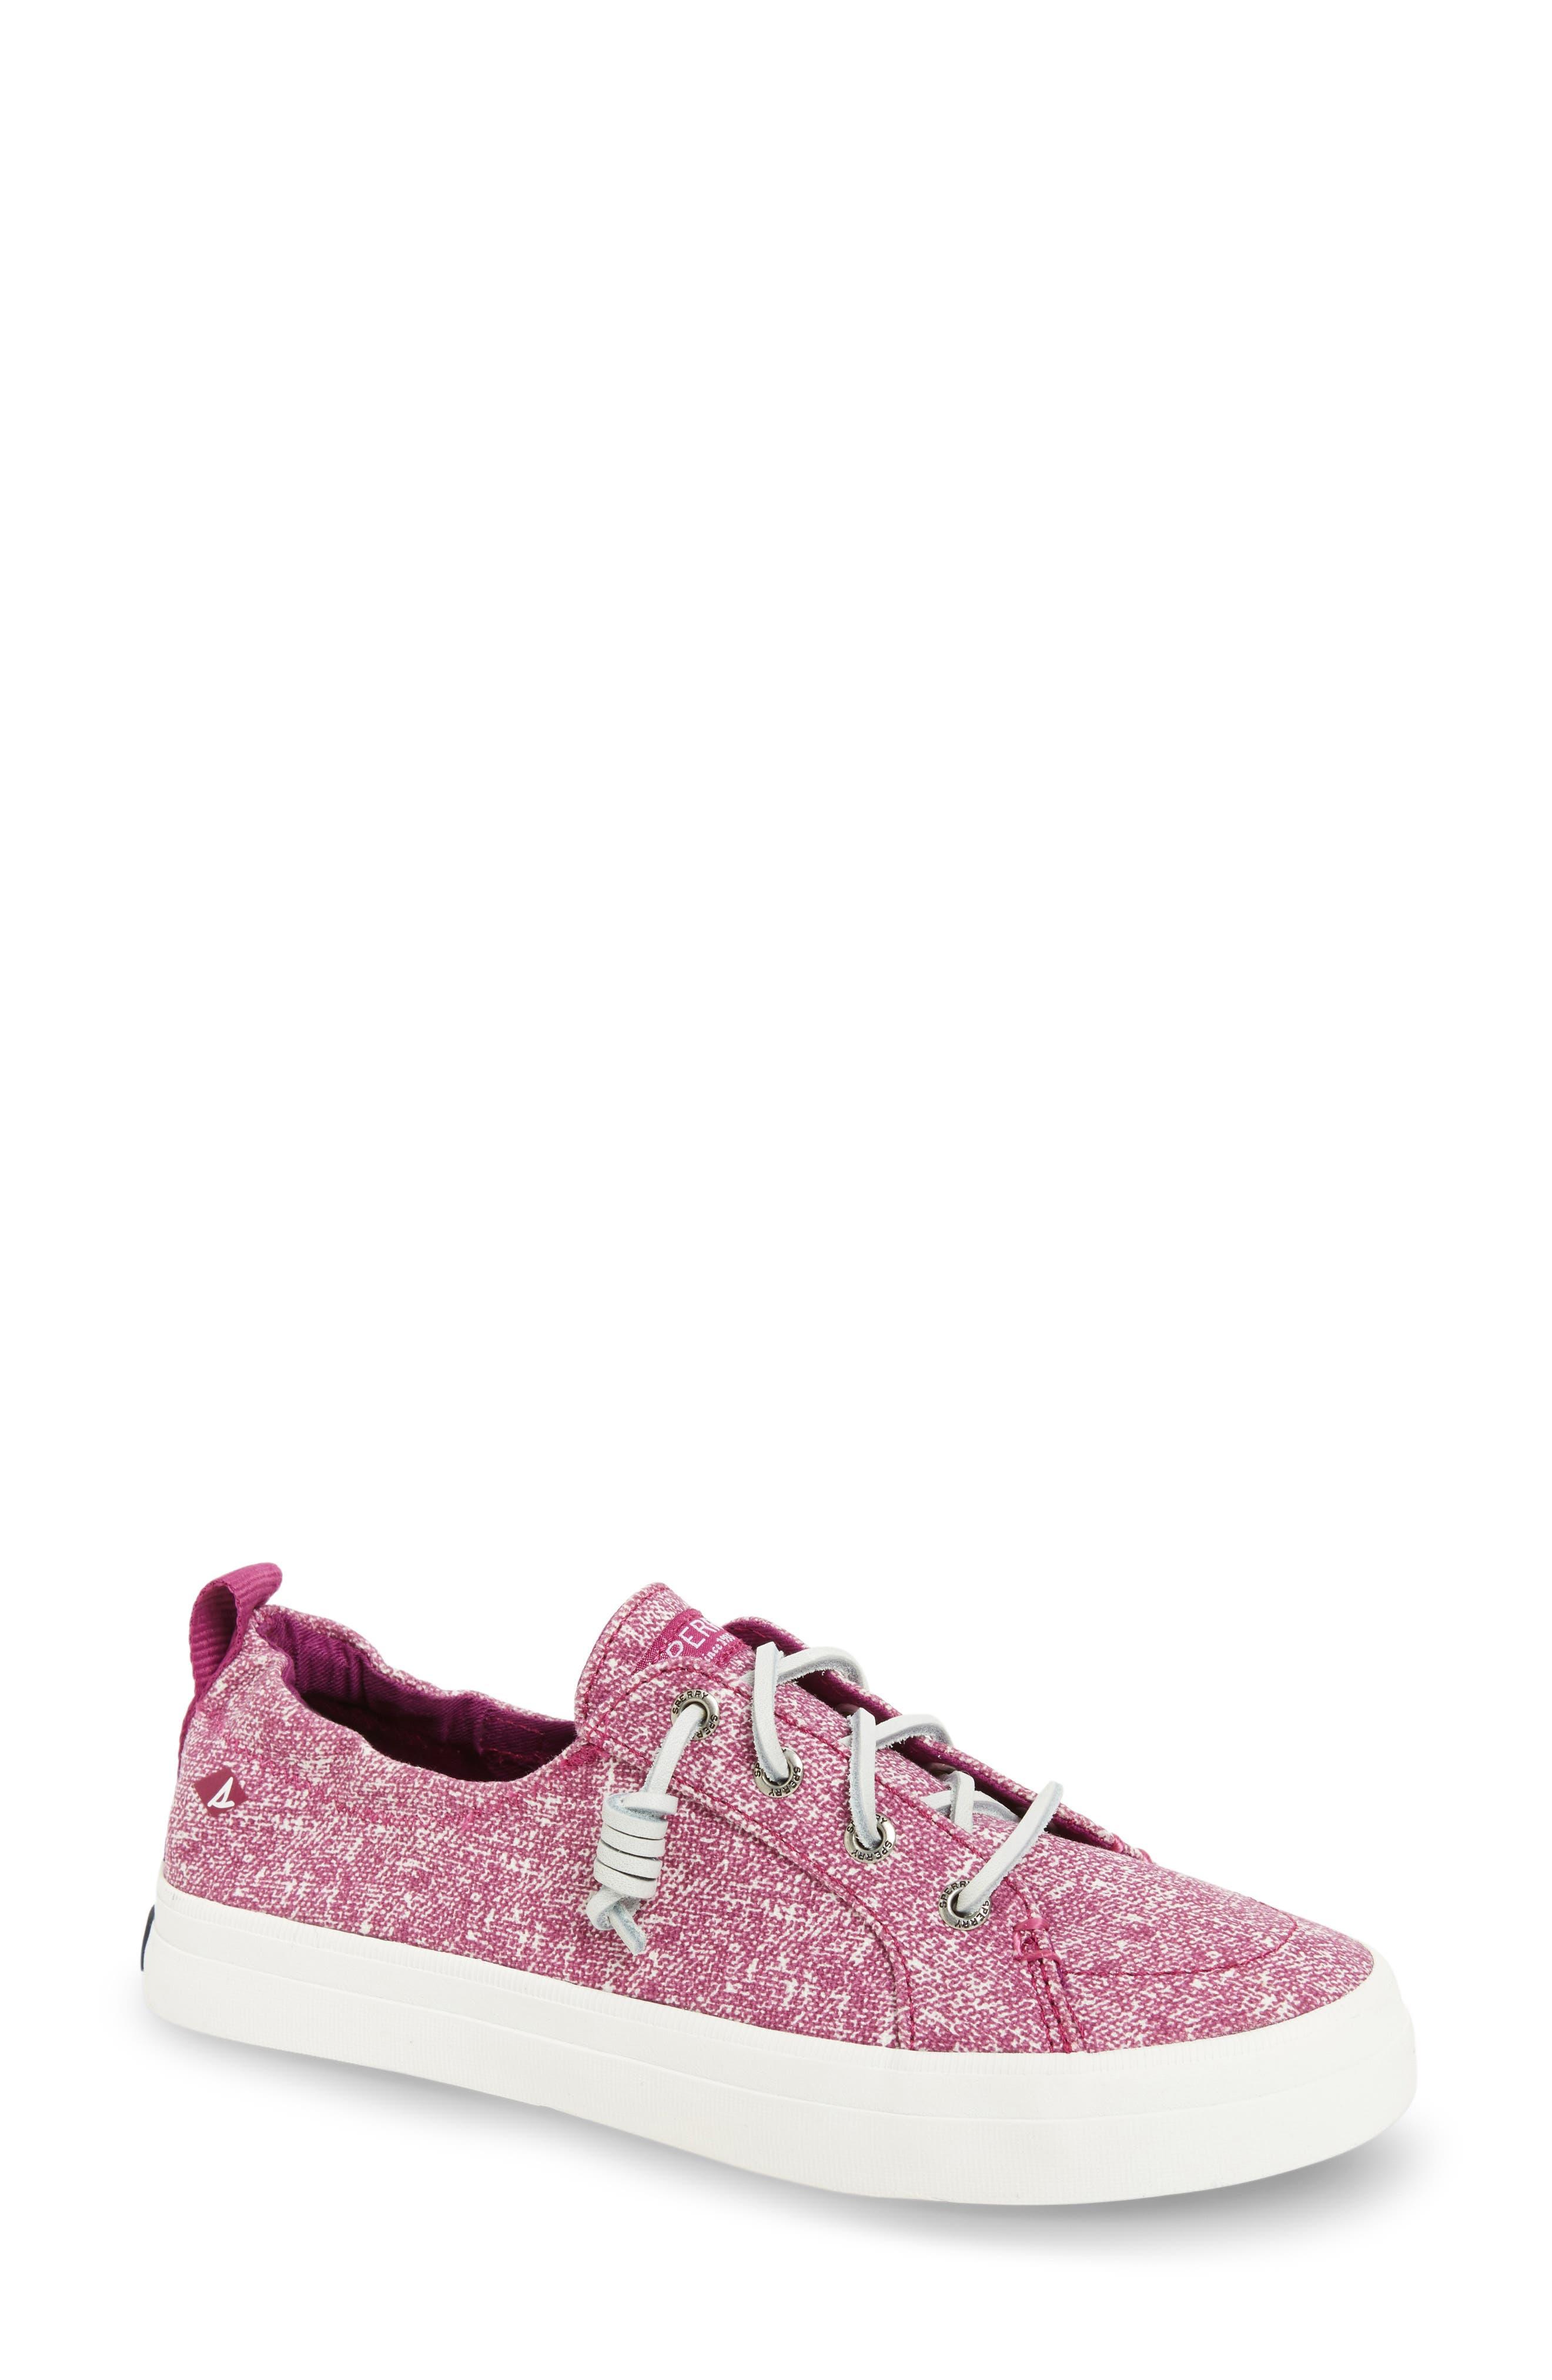 SPERRY Crest Ebb Sneaker